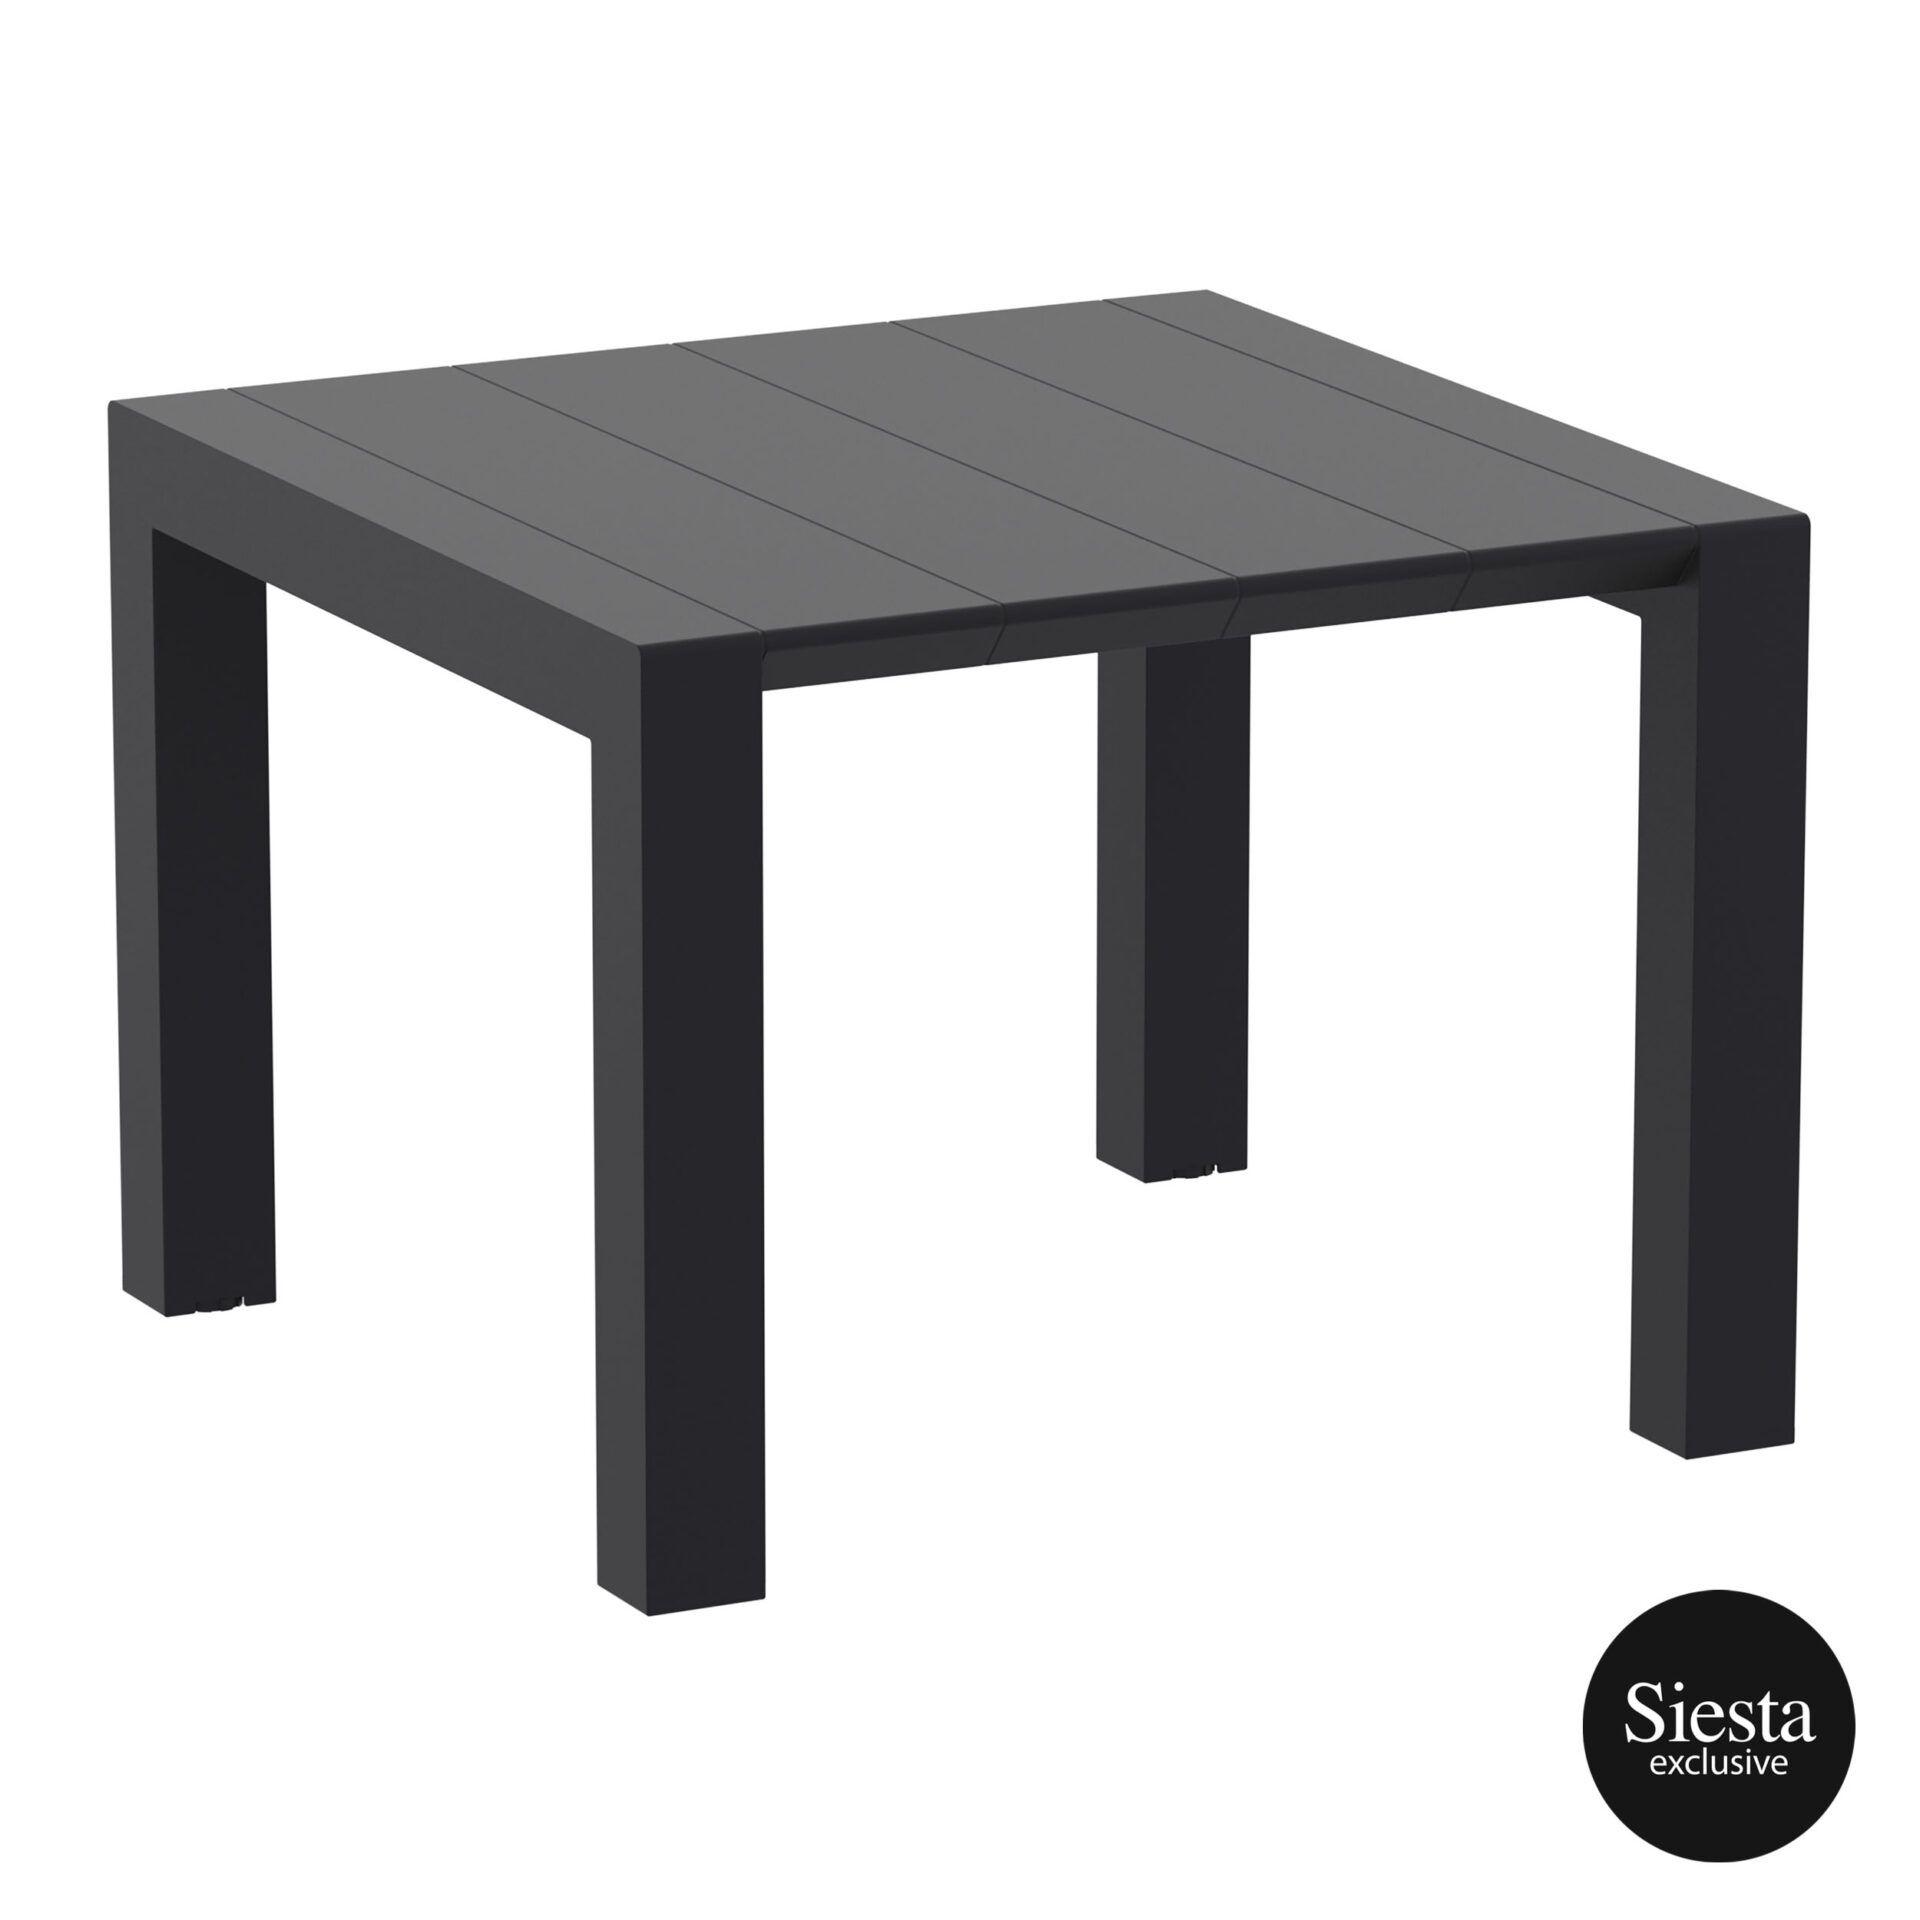 002 vegas table 100 black front side